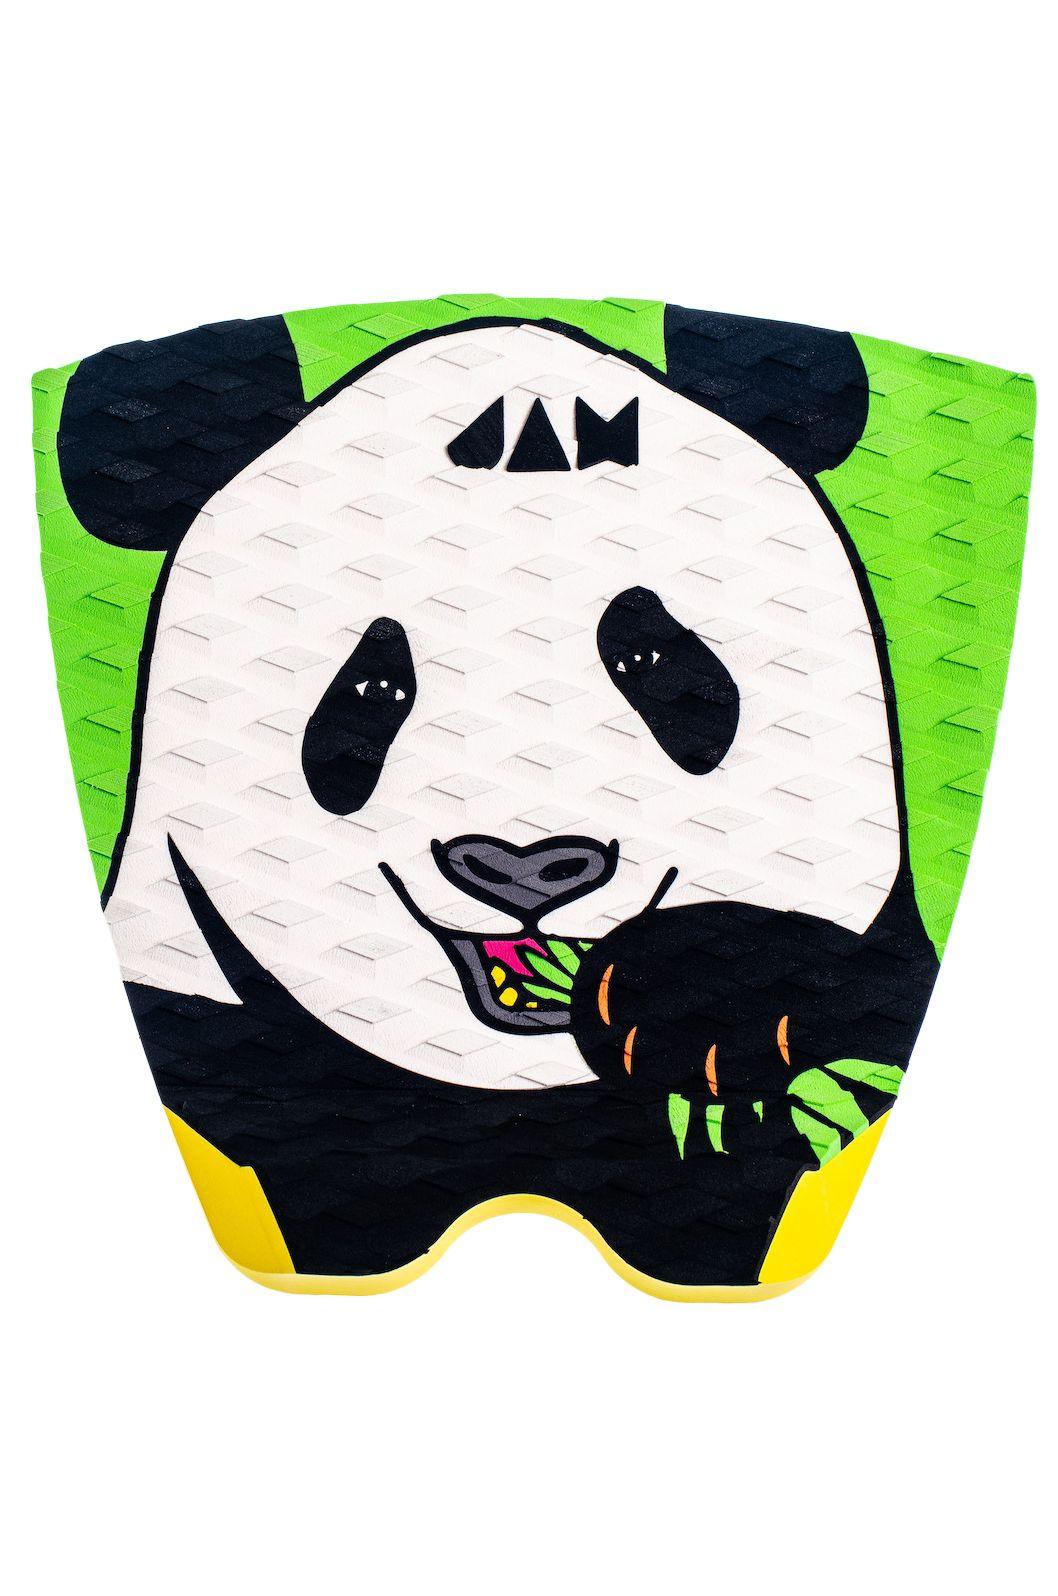 Jam Deck LIMITED EDITION WILLIAN CARDOSO PRO MODEL Panda